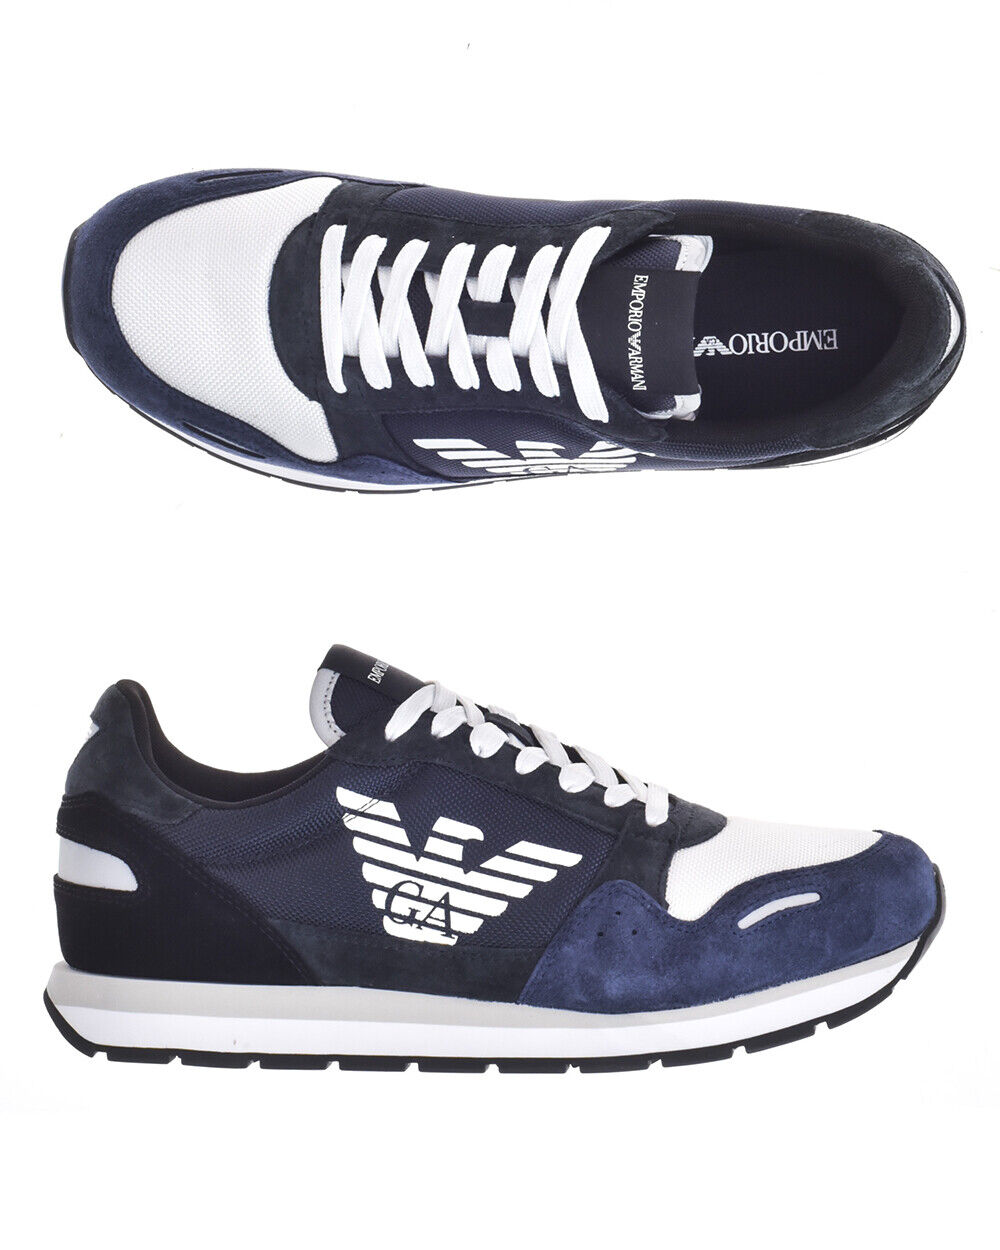 Emporio Armani shoes Sneaker Leather Man bluee X4X215XL200 A034 Sz.42 MAKE OFFER